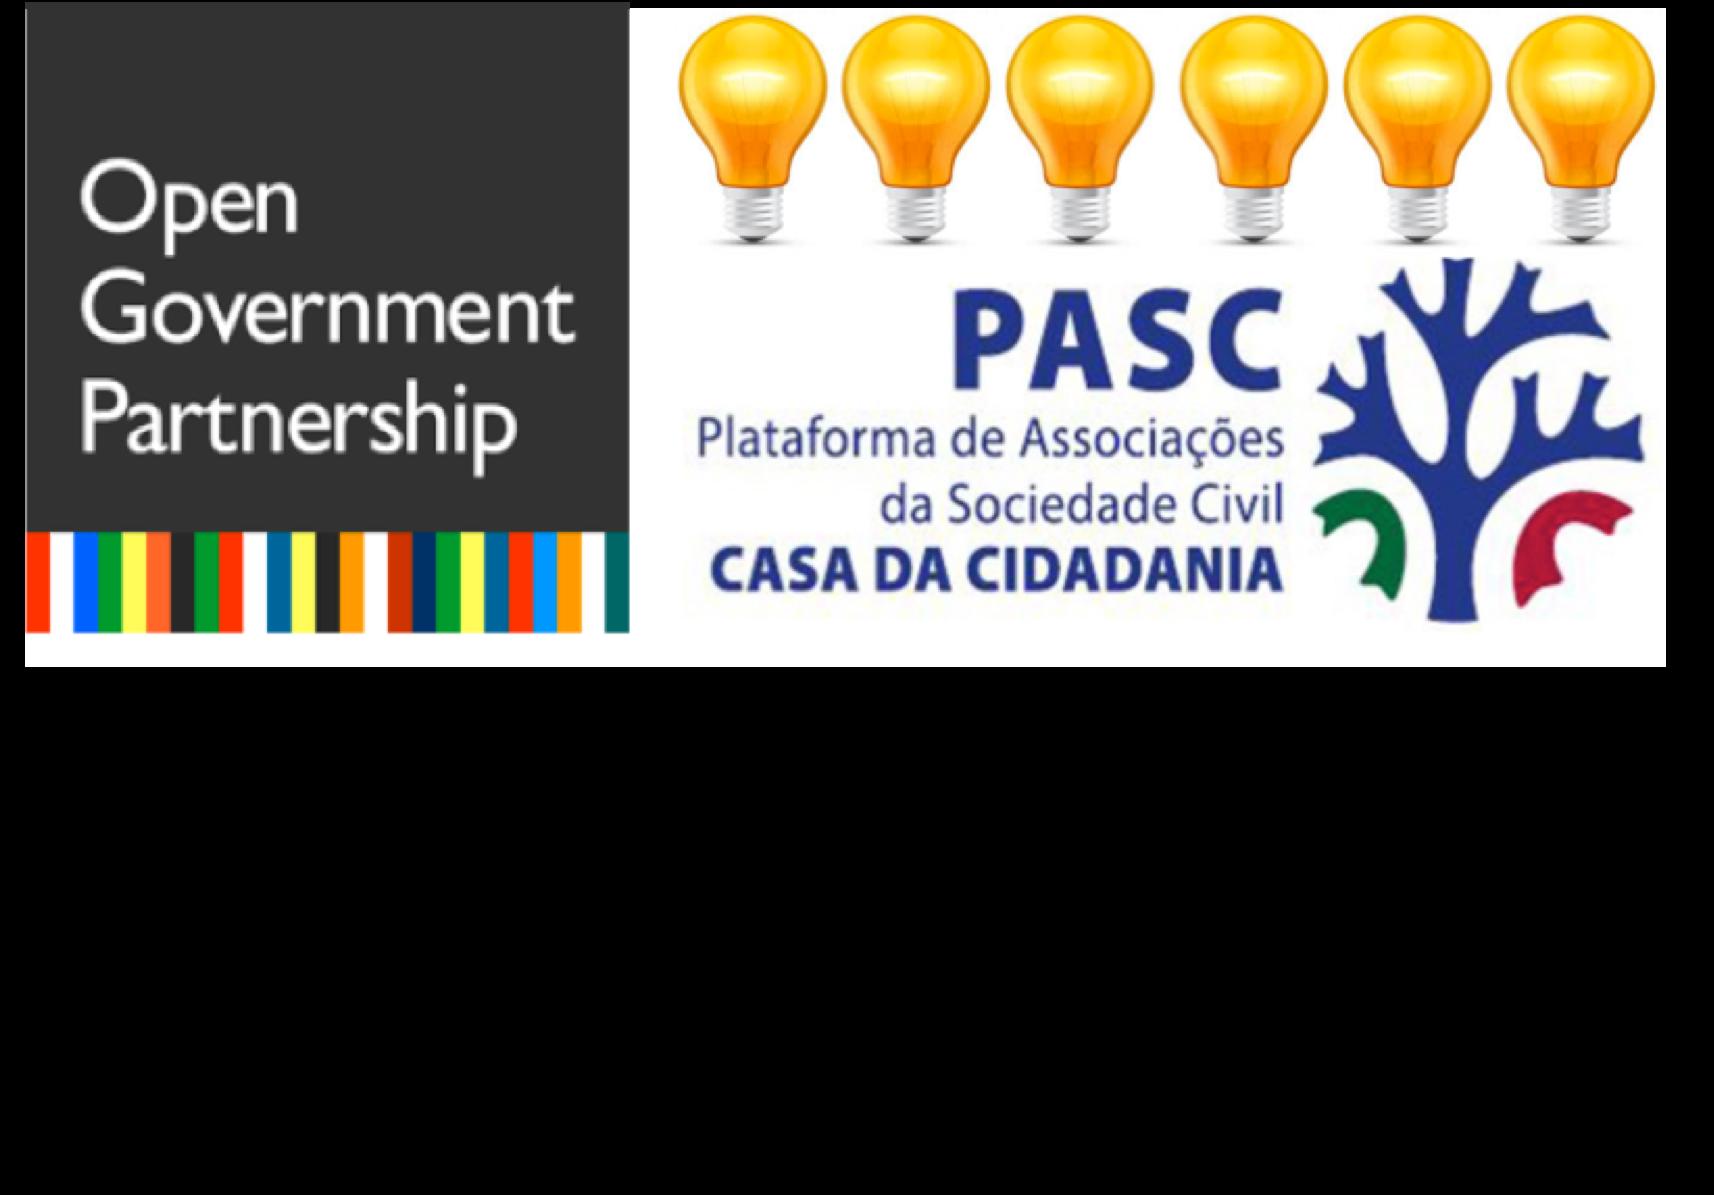 ogp-pasc-questionario-iniciativas